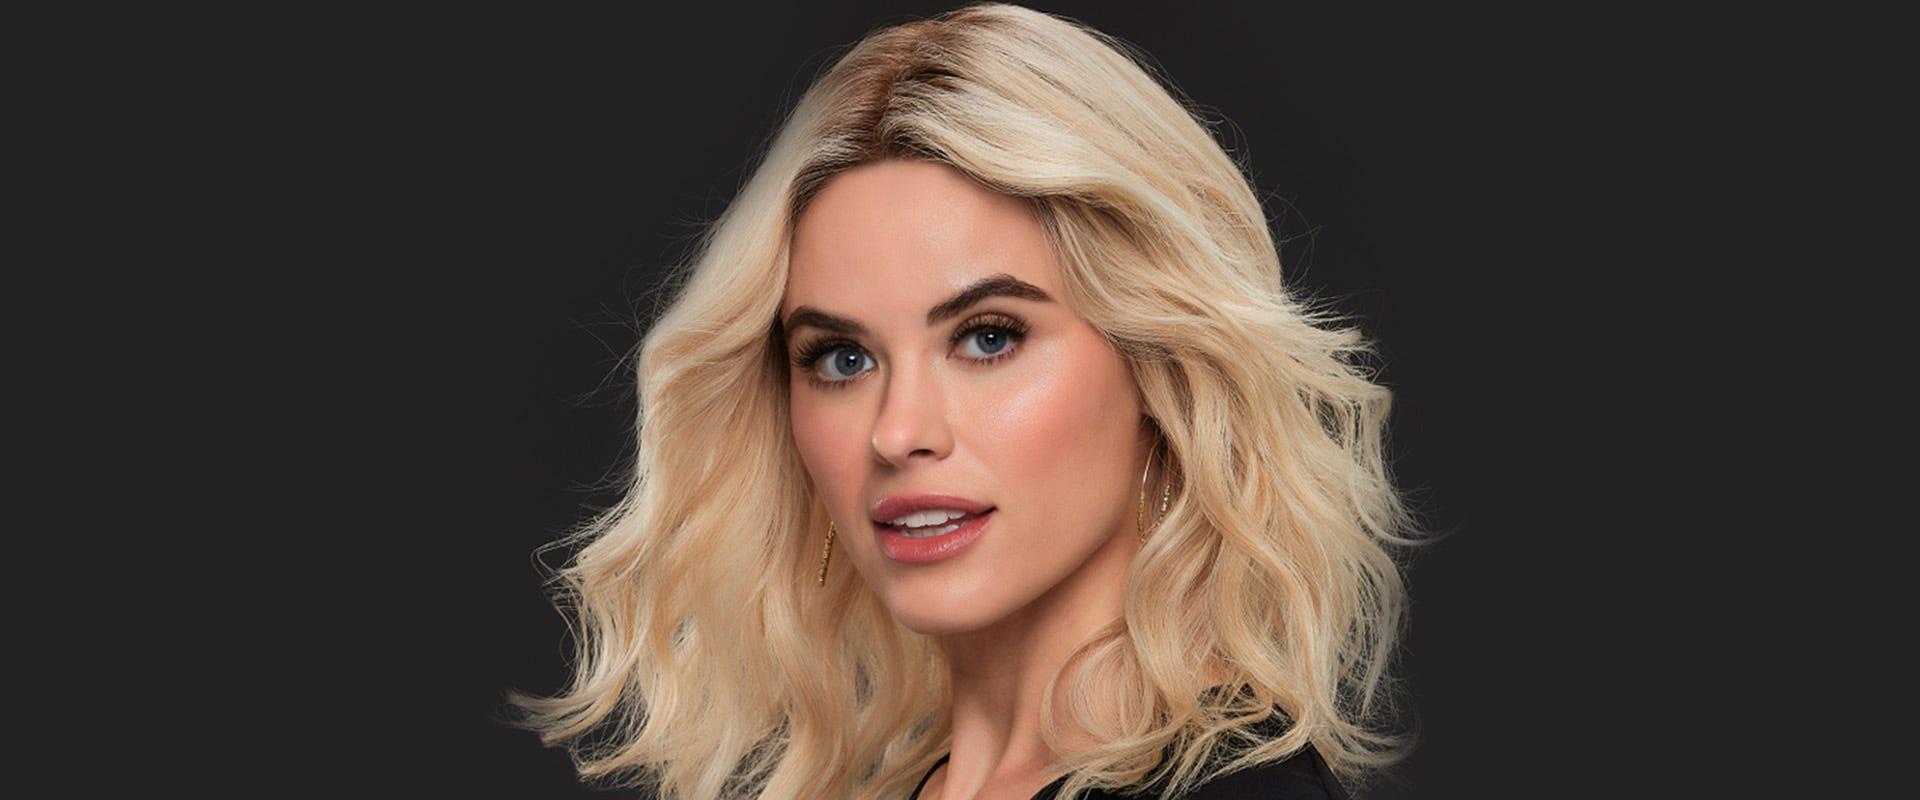 2019 February Jon Renau California Blonde Collection